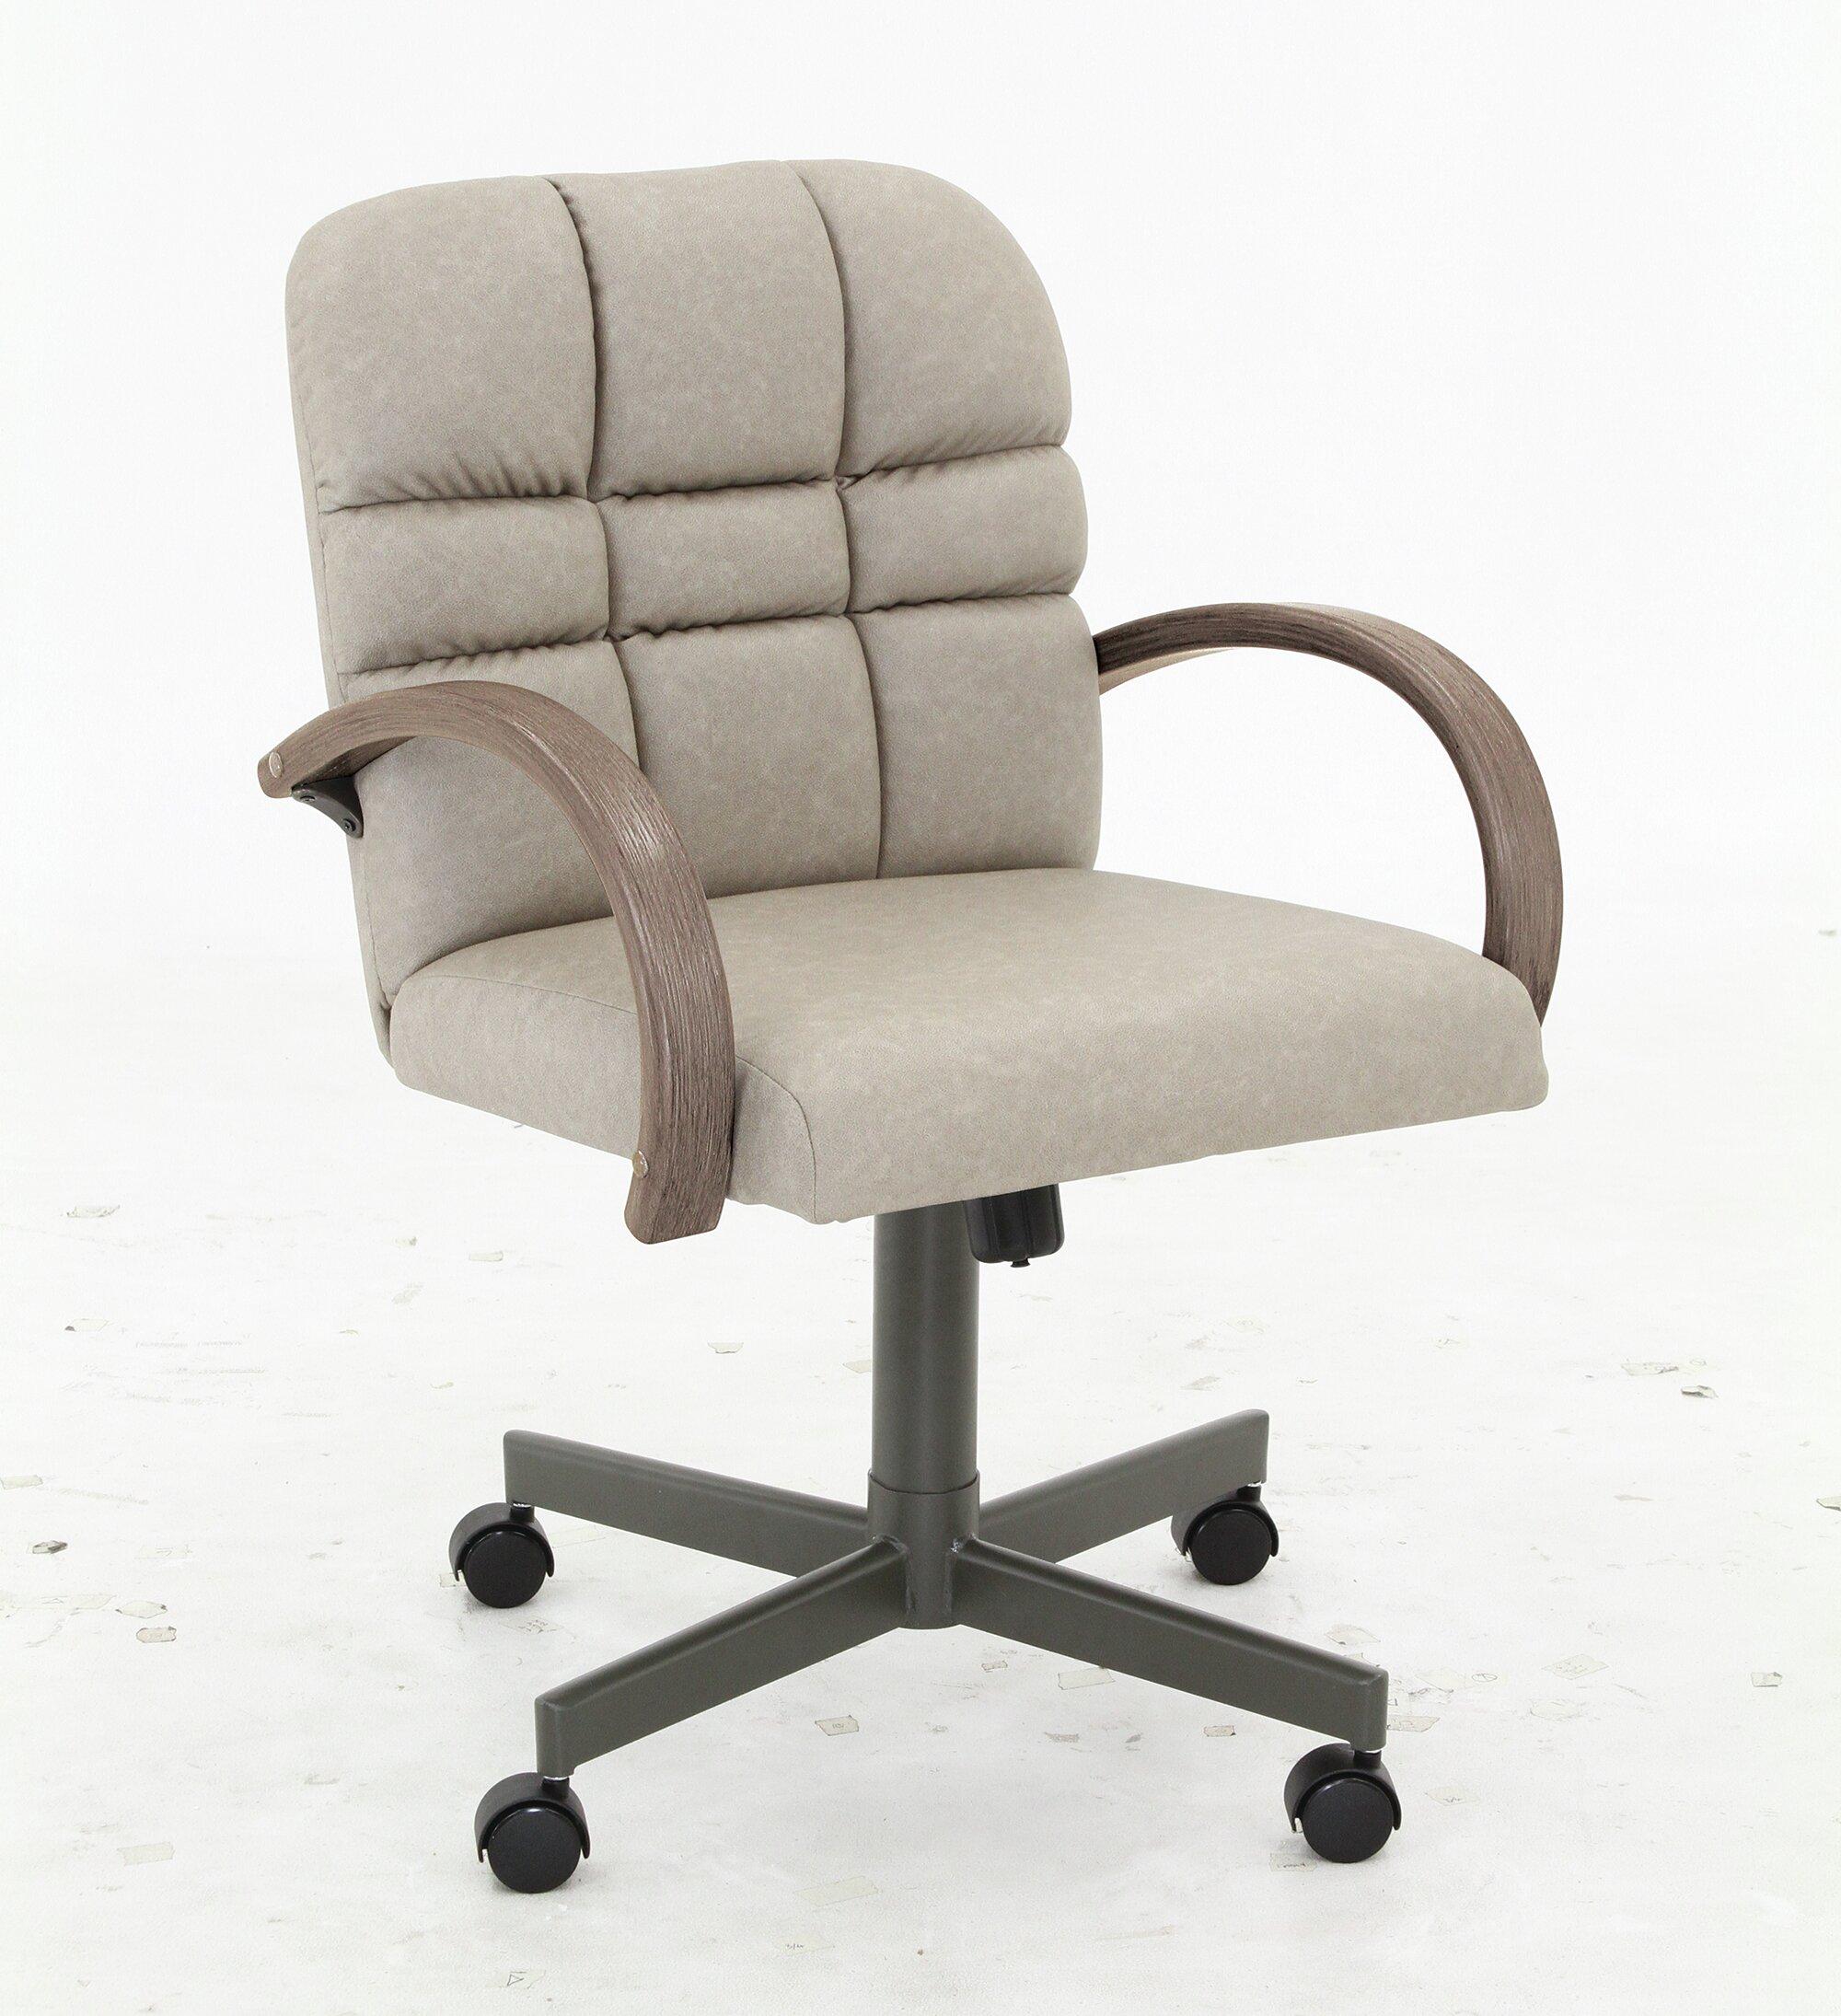 Superb Henrika Swivel Tilt Upholstered Dining Chair Inzonedesignstudio Interior Chair Design Inzonedesignstudiocom